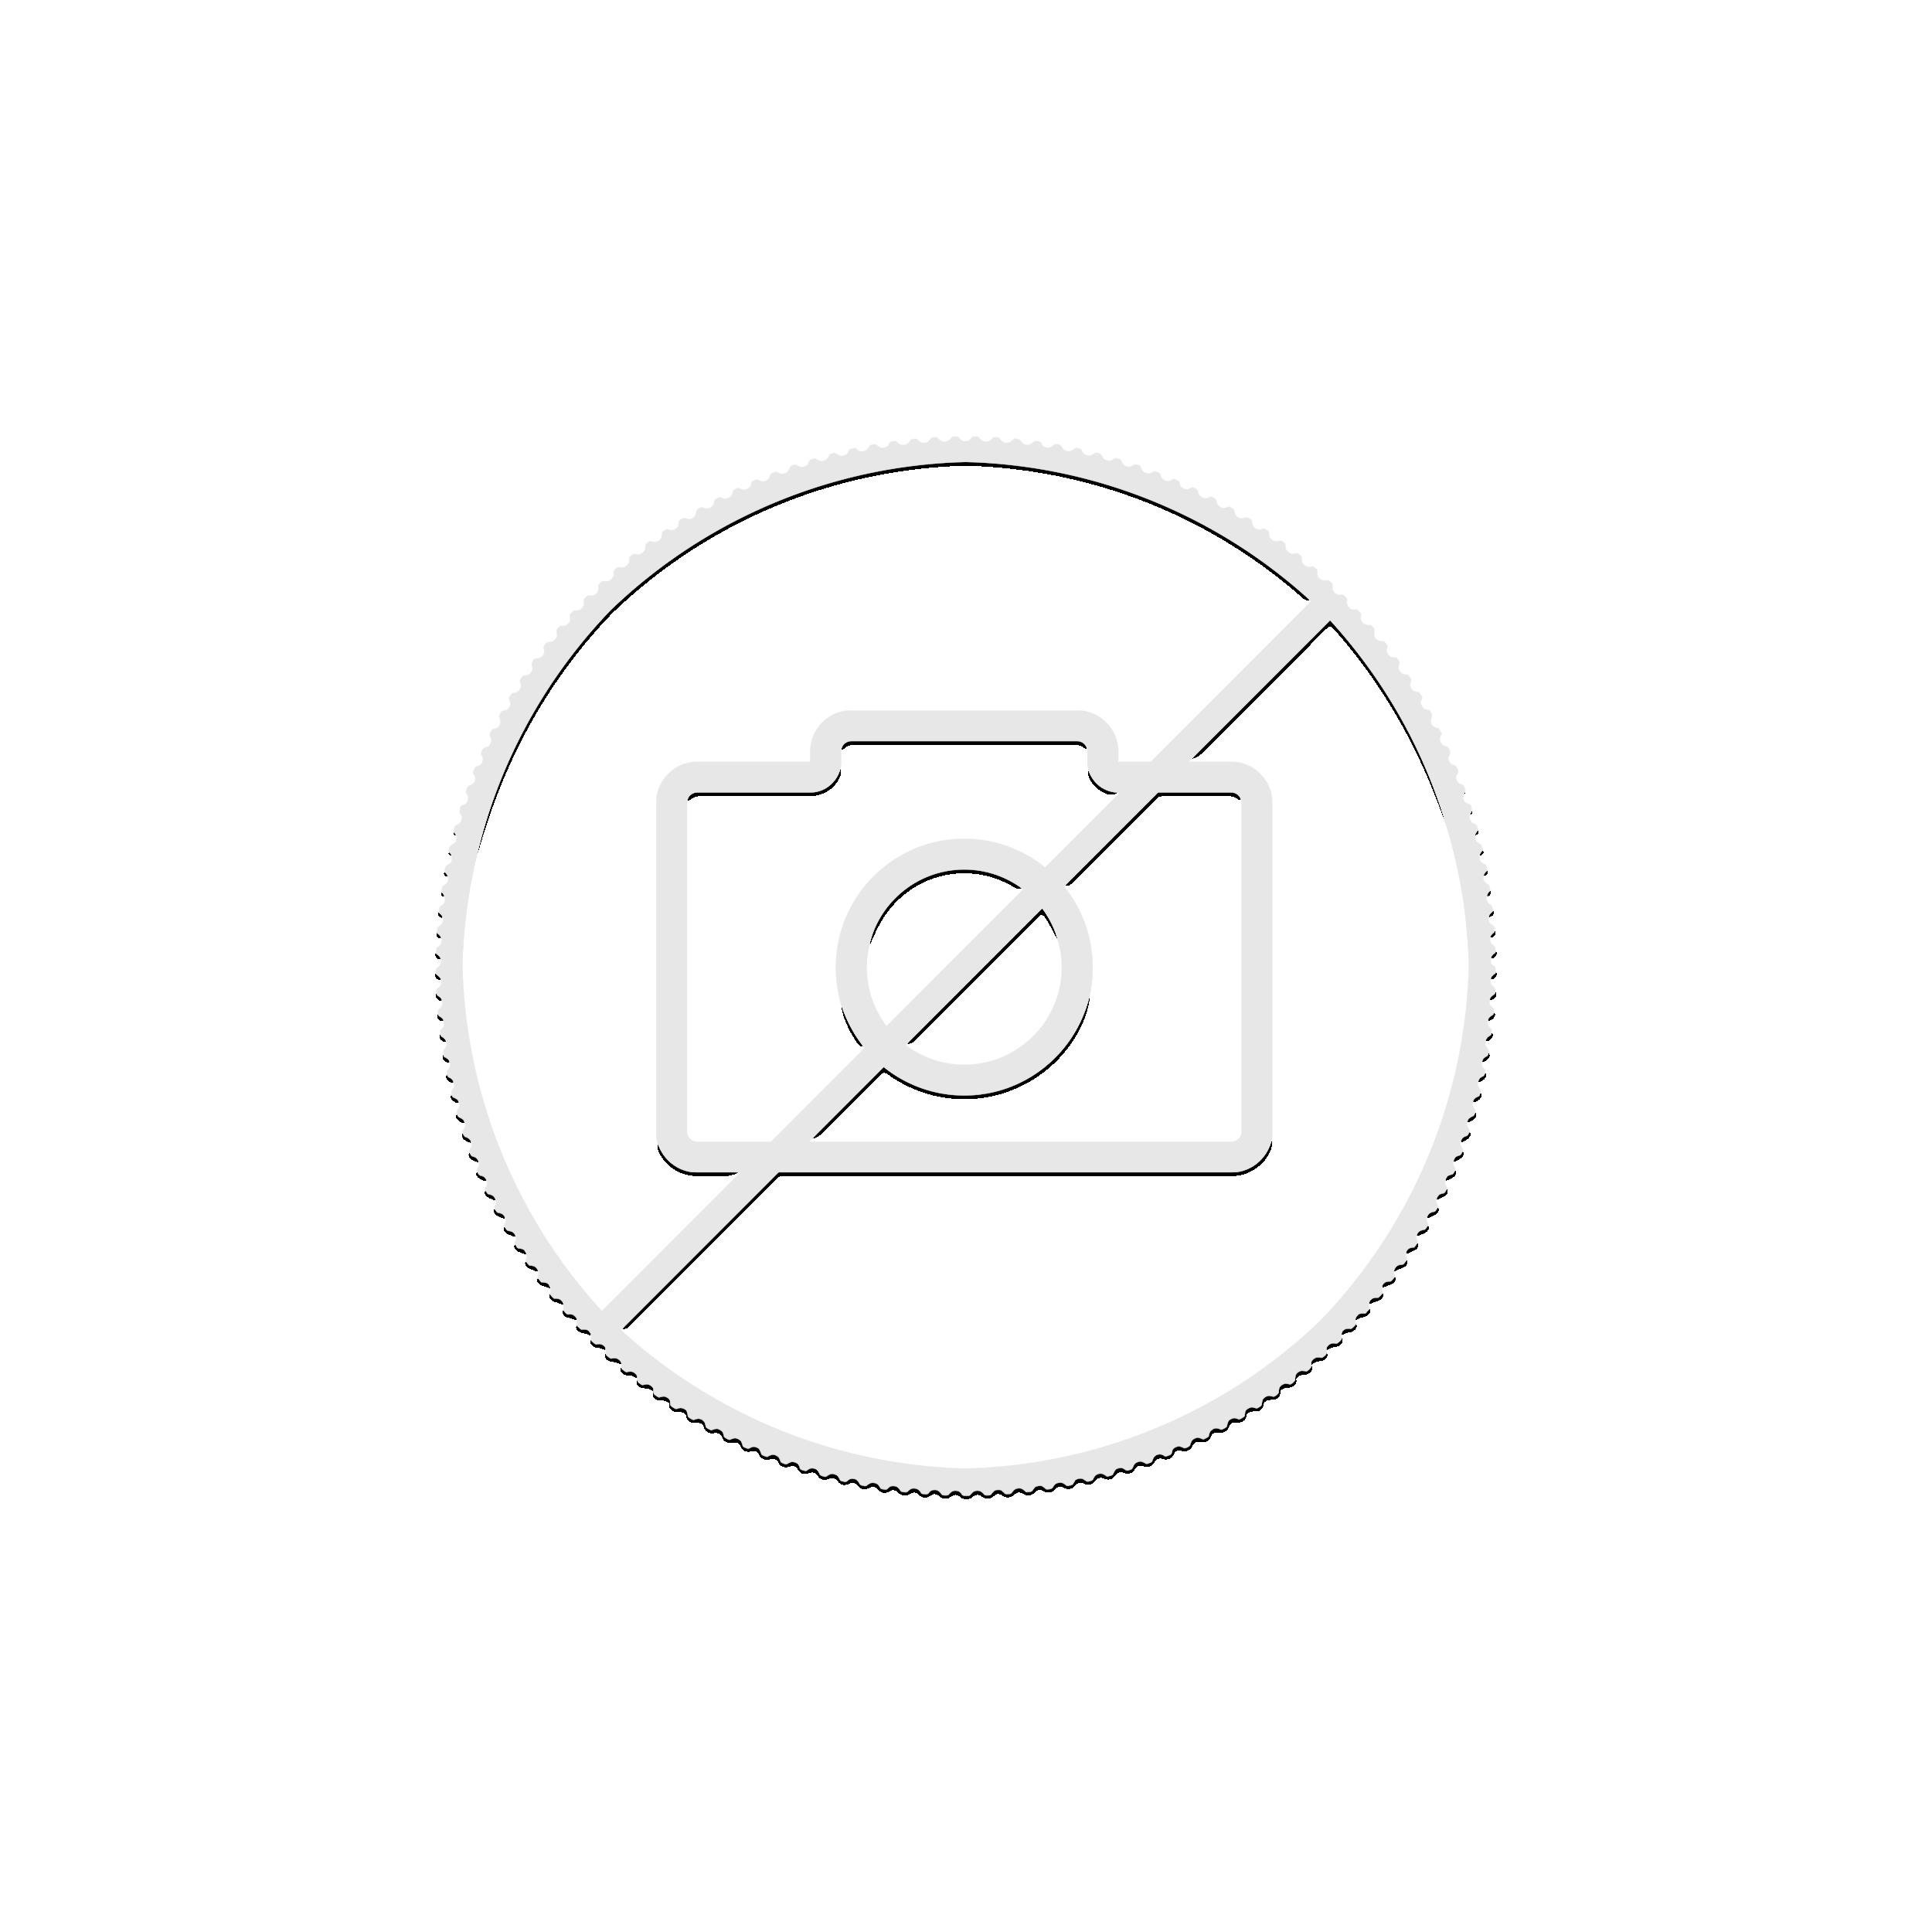 2,5 grams gold bar Pamp Suisse Fortuna